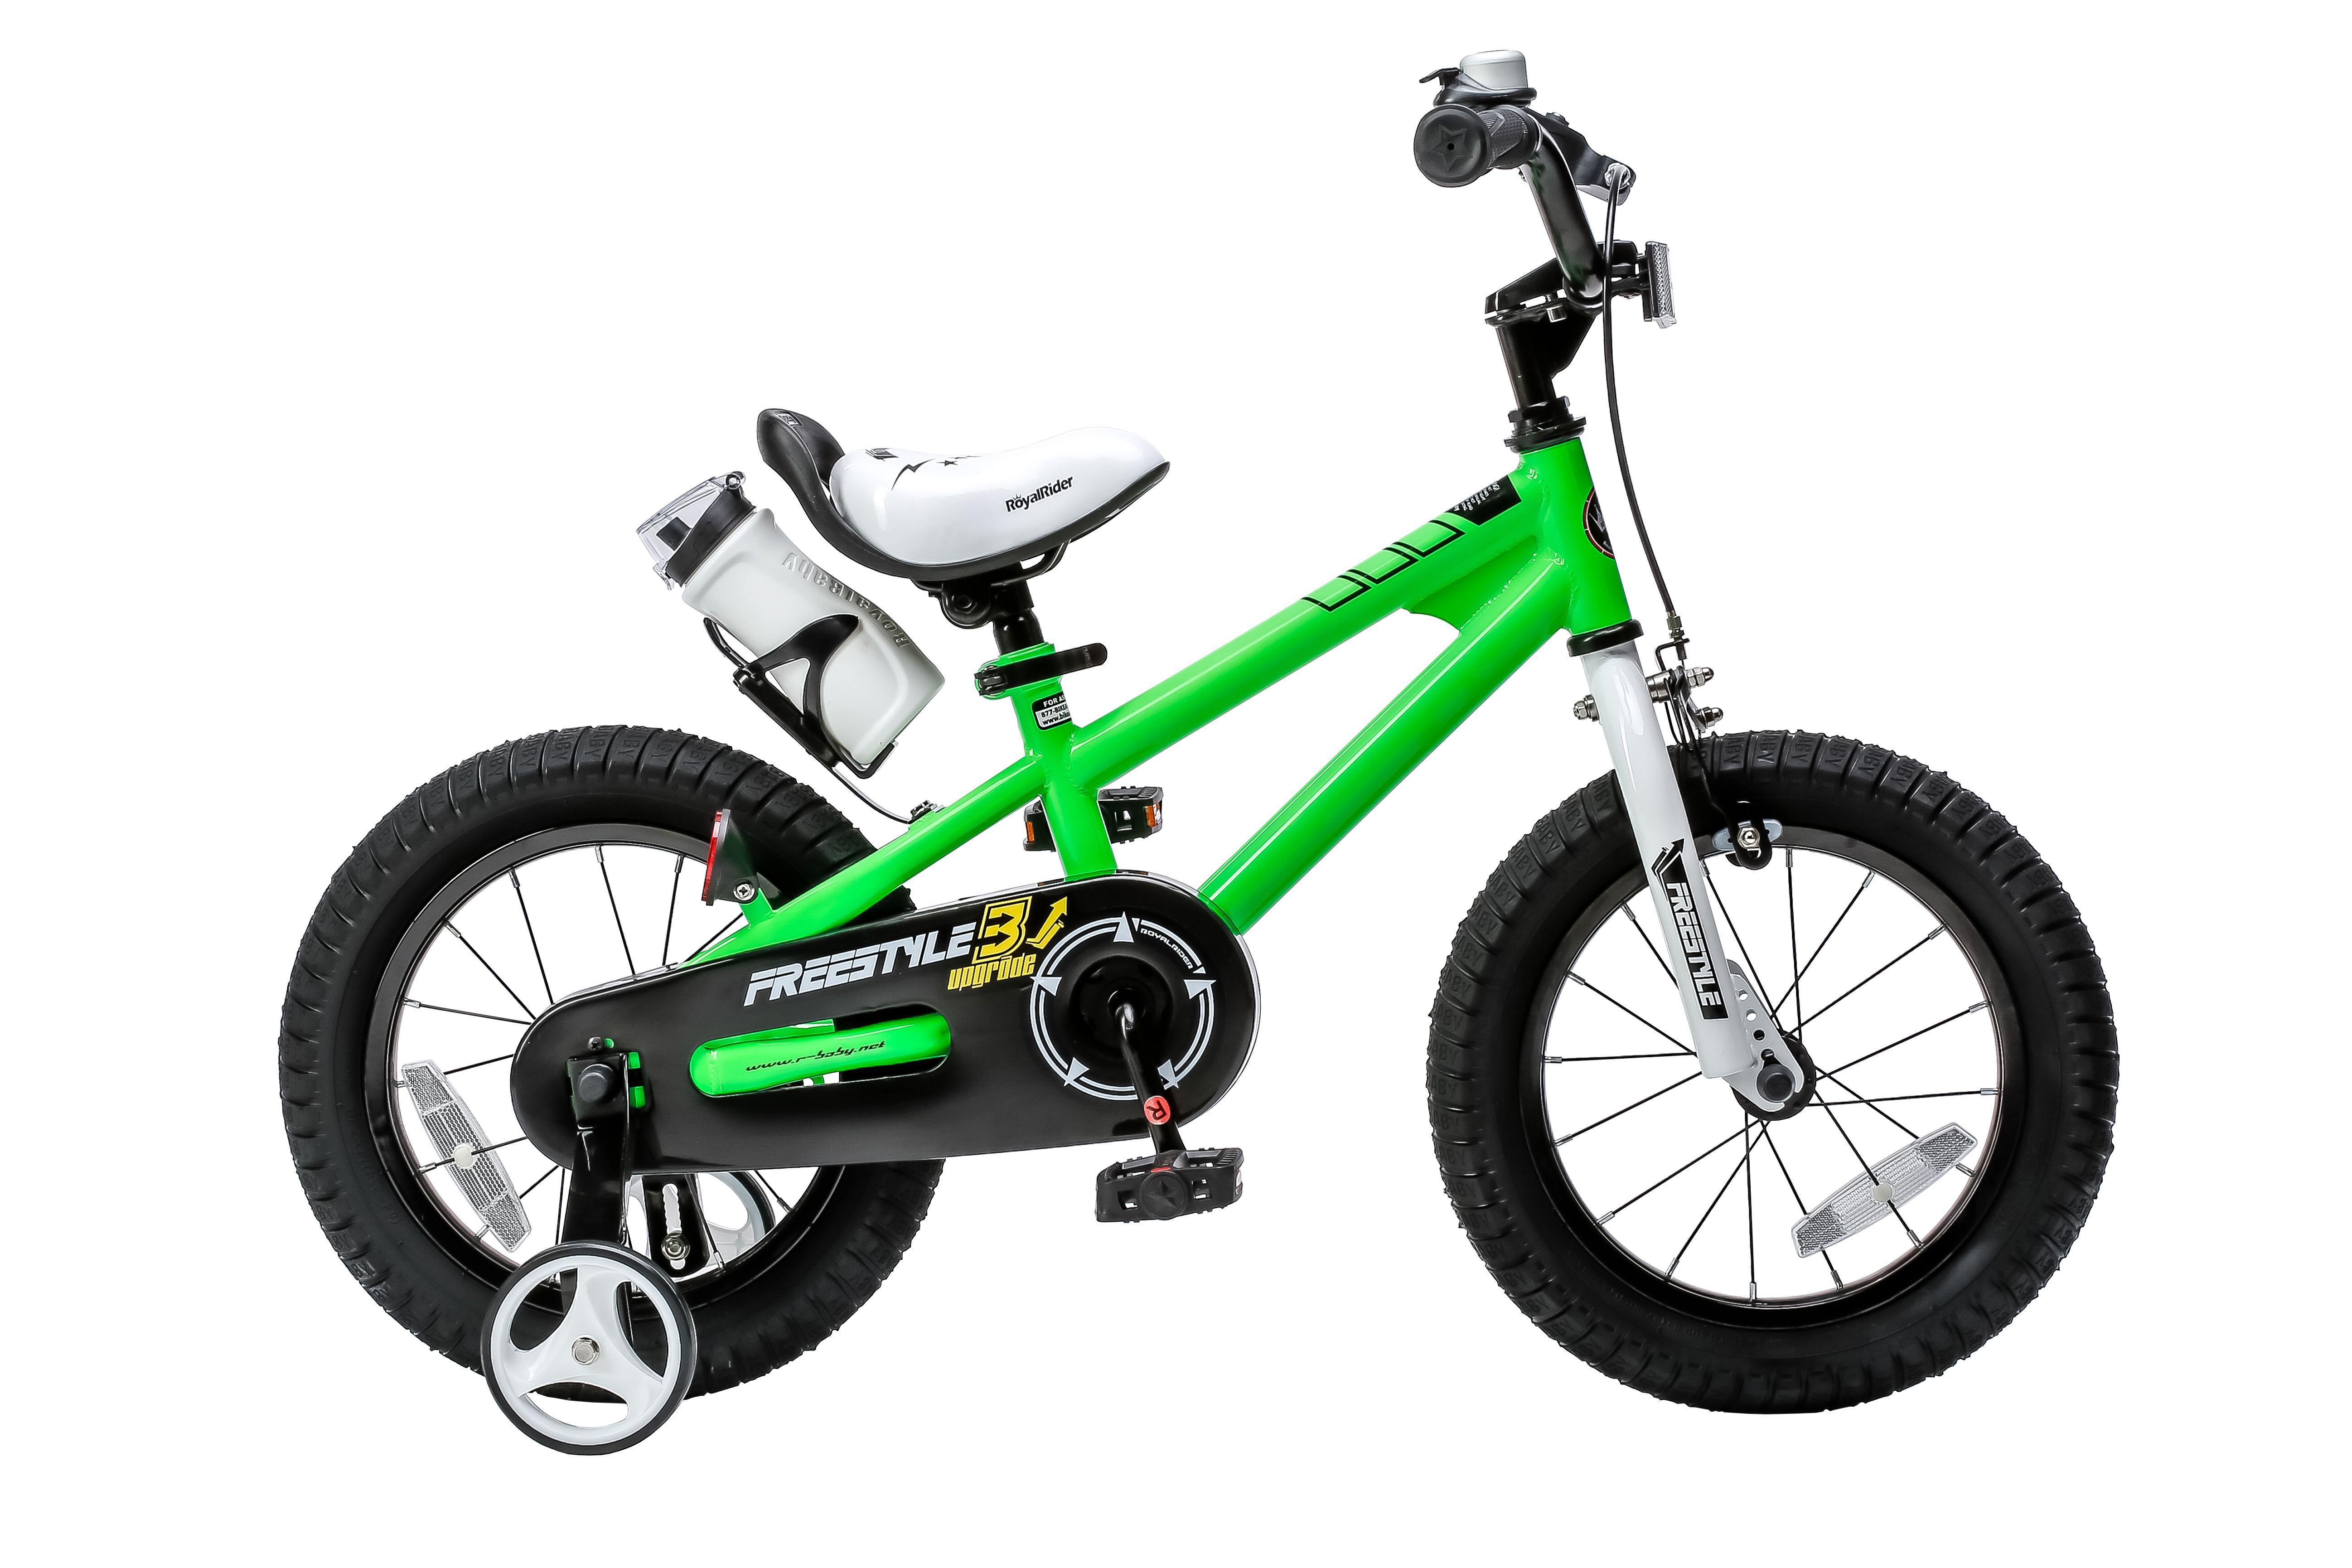 Royalbaby Freestyle Bmx Kid S Bike 12 Inch Bike For Boys And